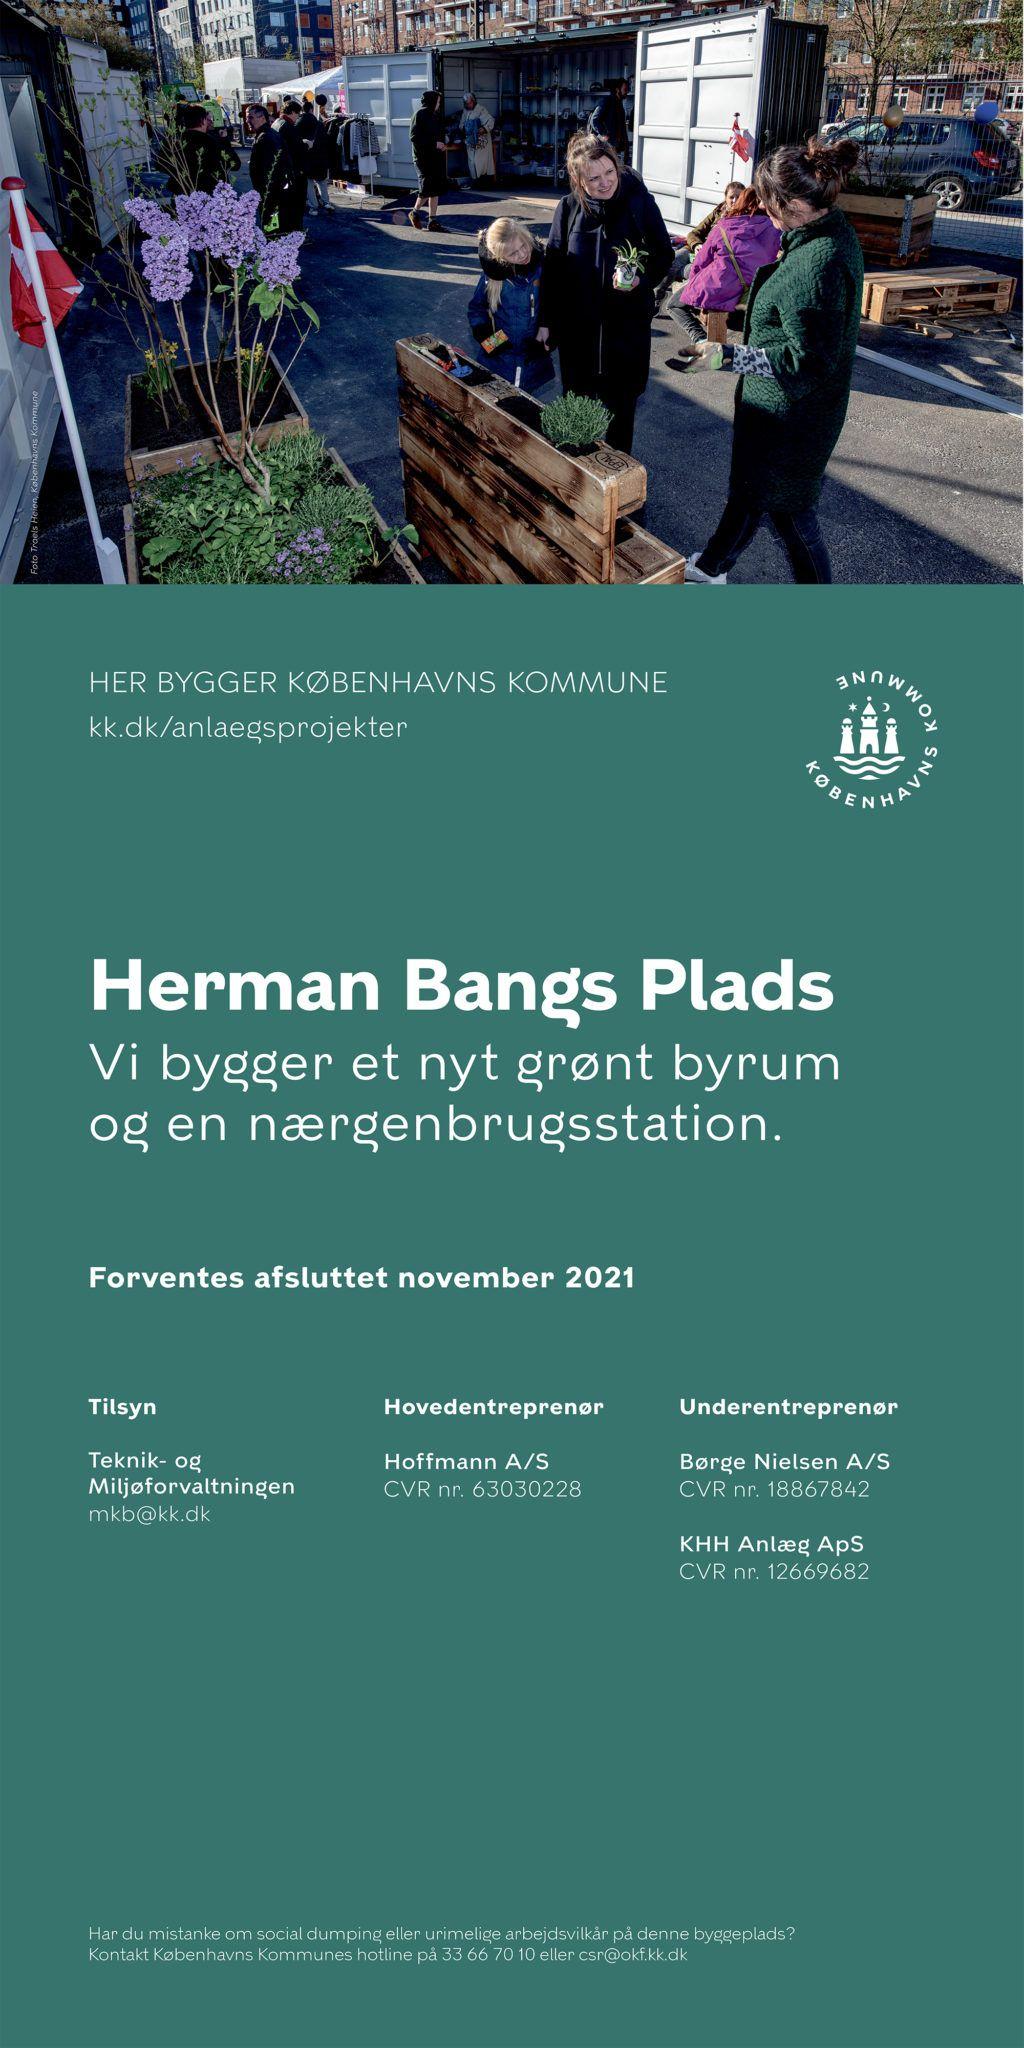 Herman Bangs Plads byggeplads-skilt